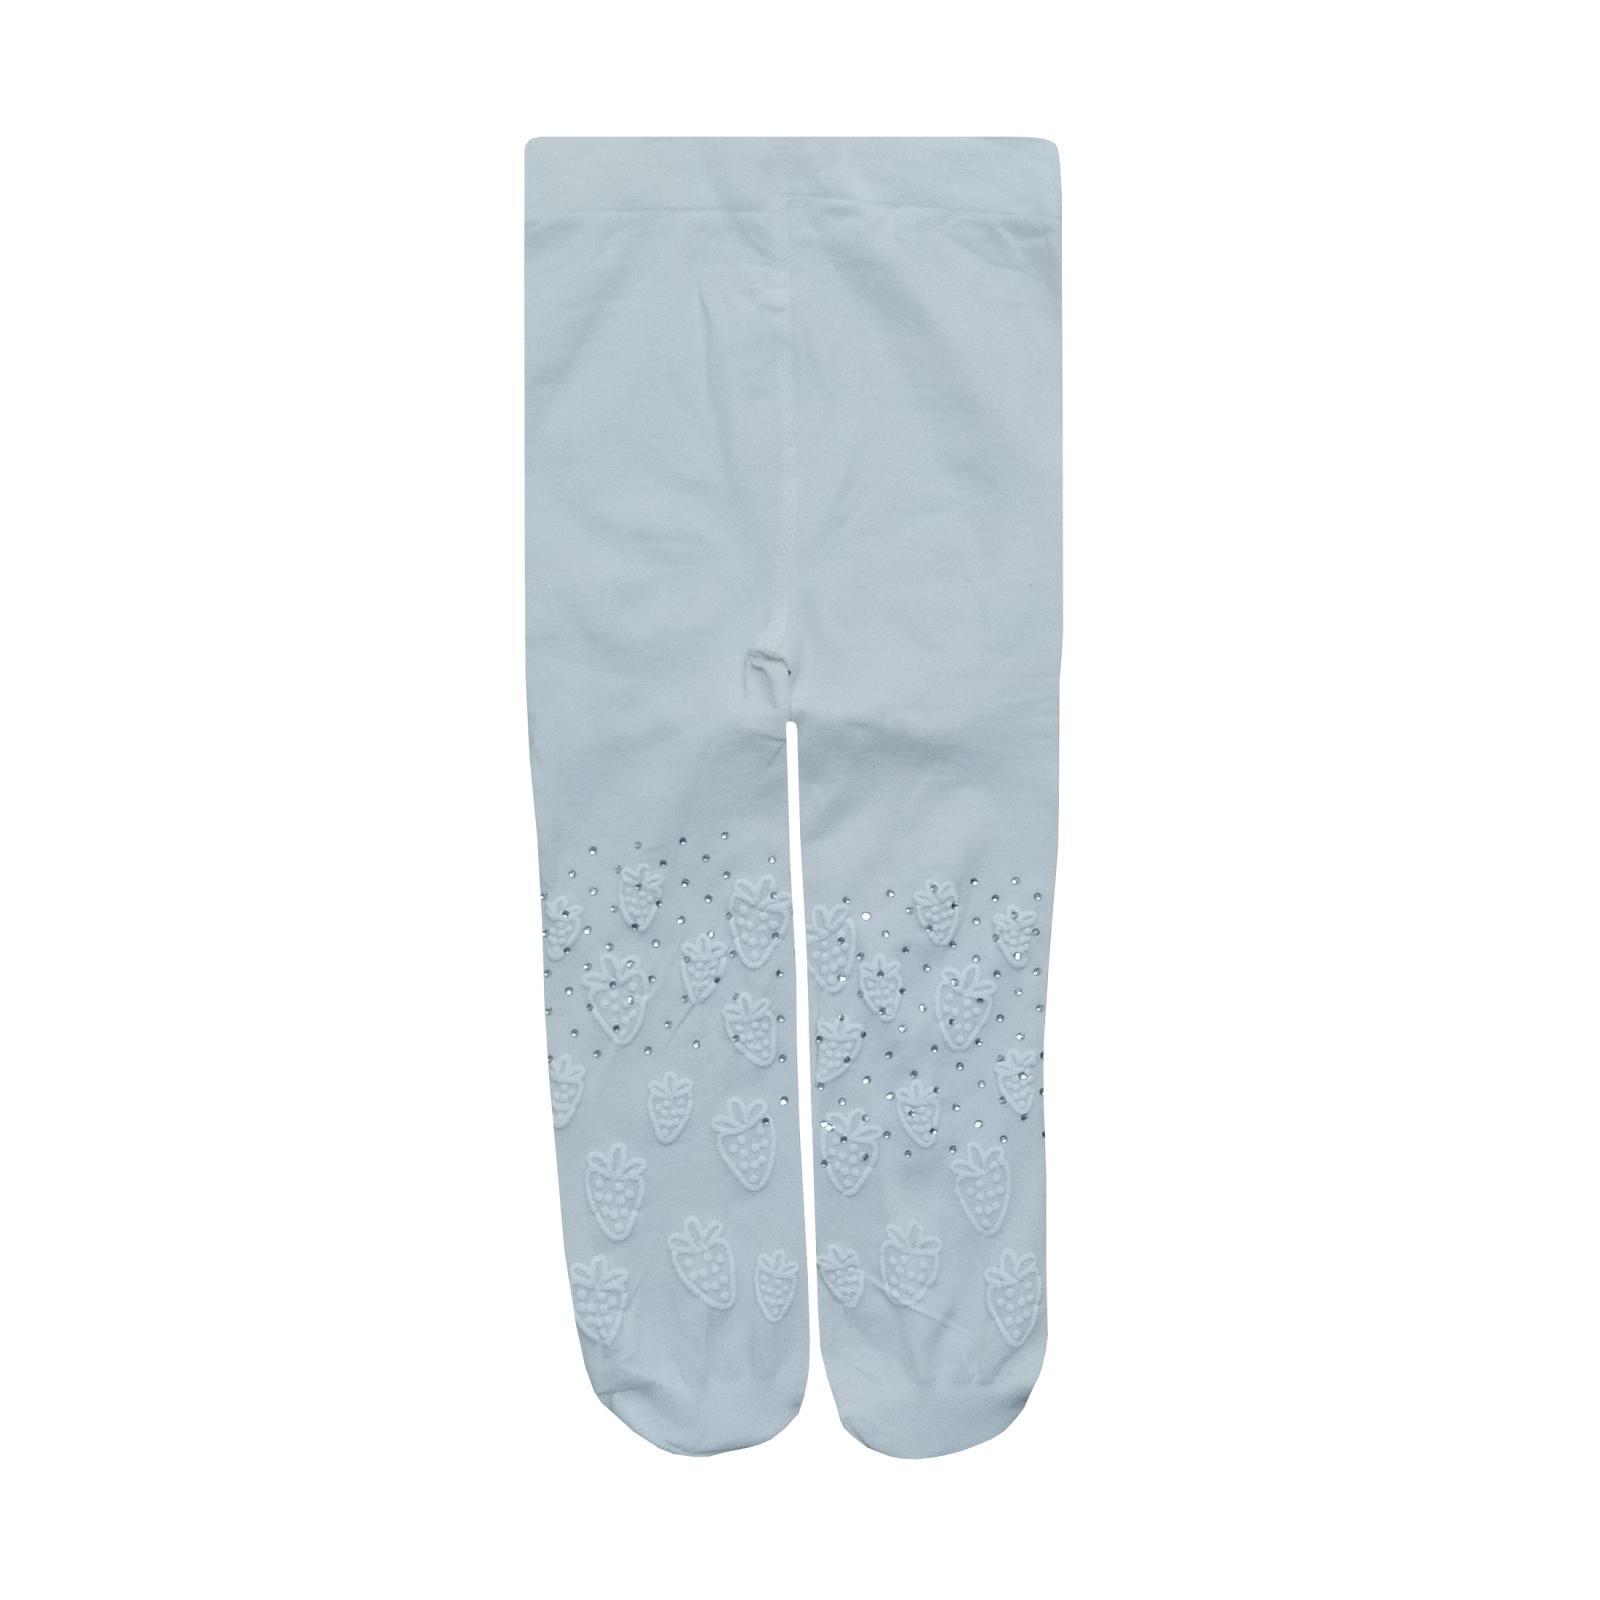 جوراب شلواری نوزادی دخترانه کد J99-02